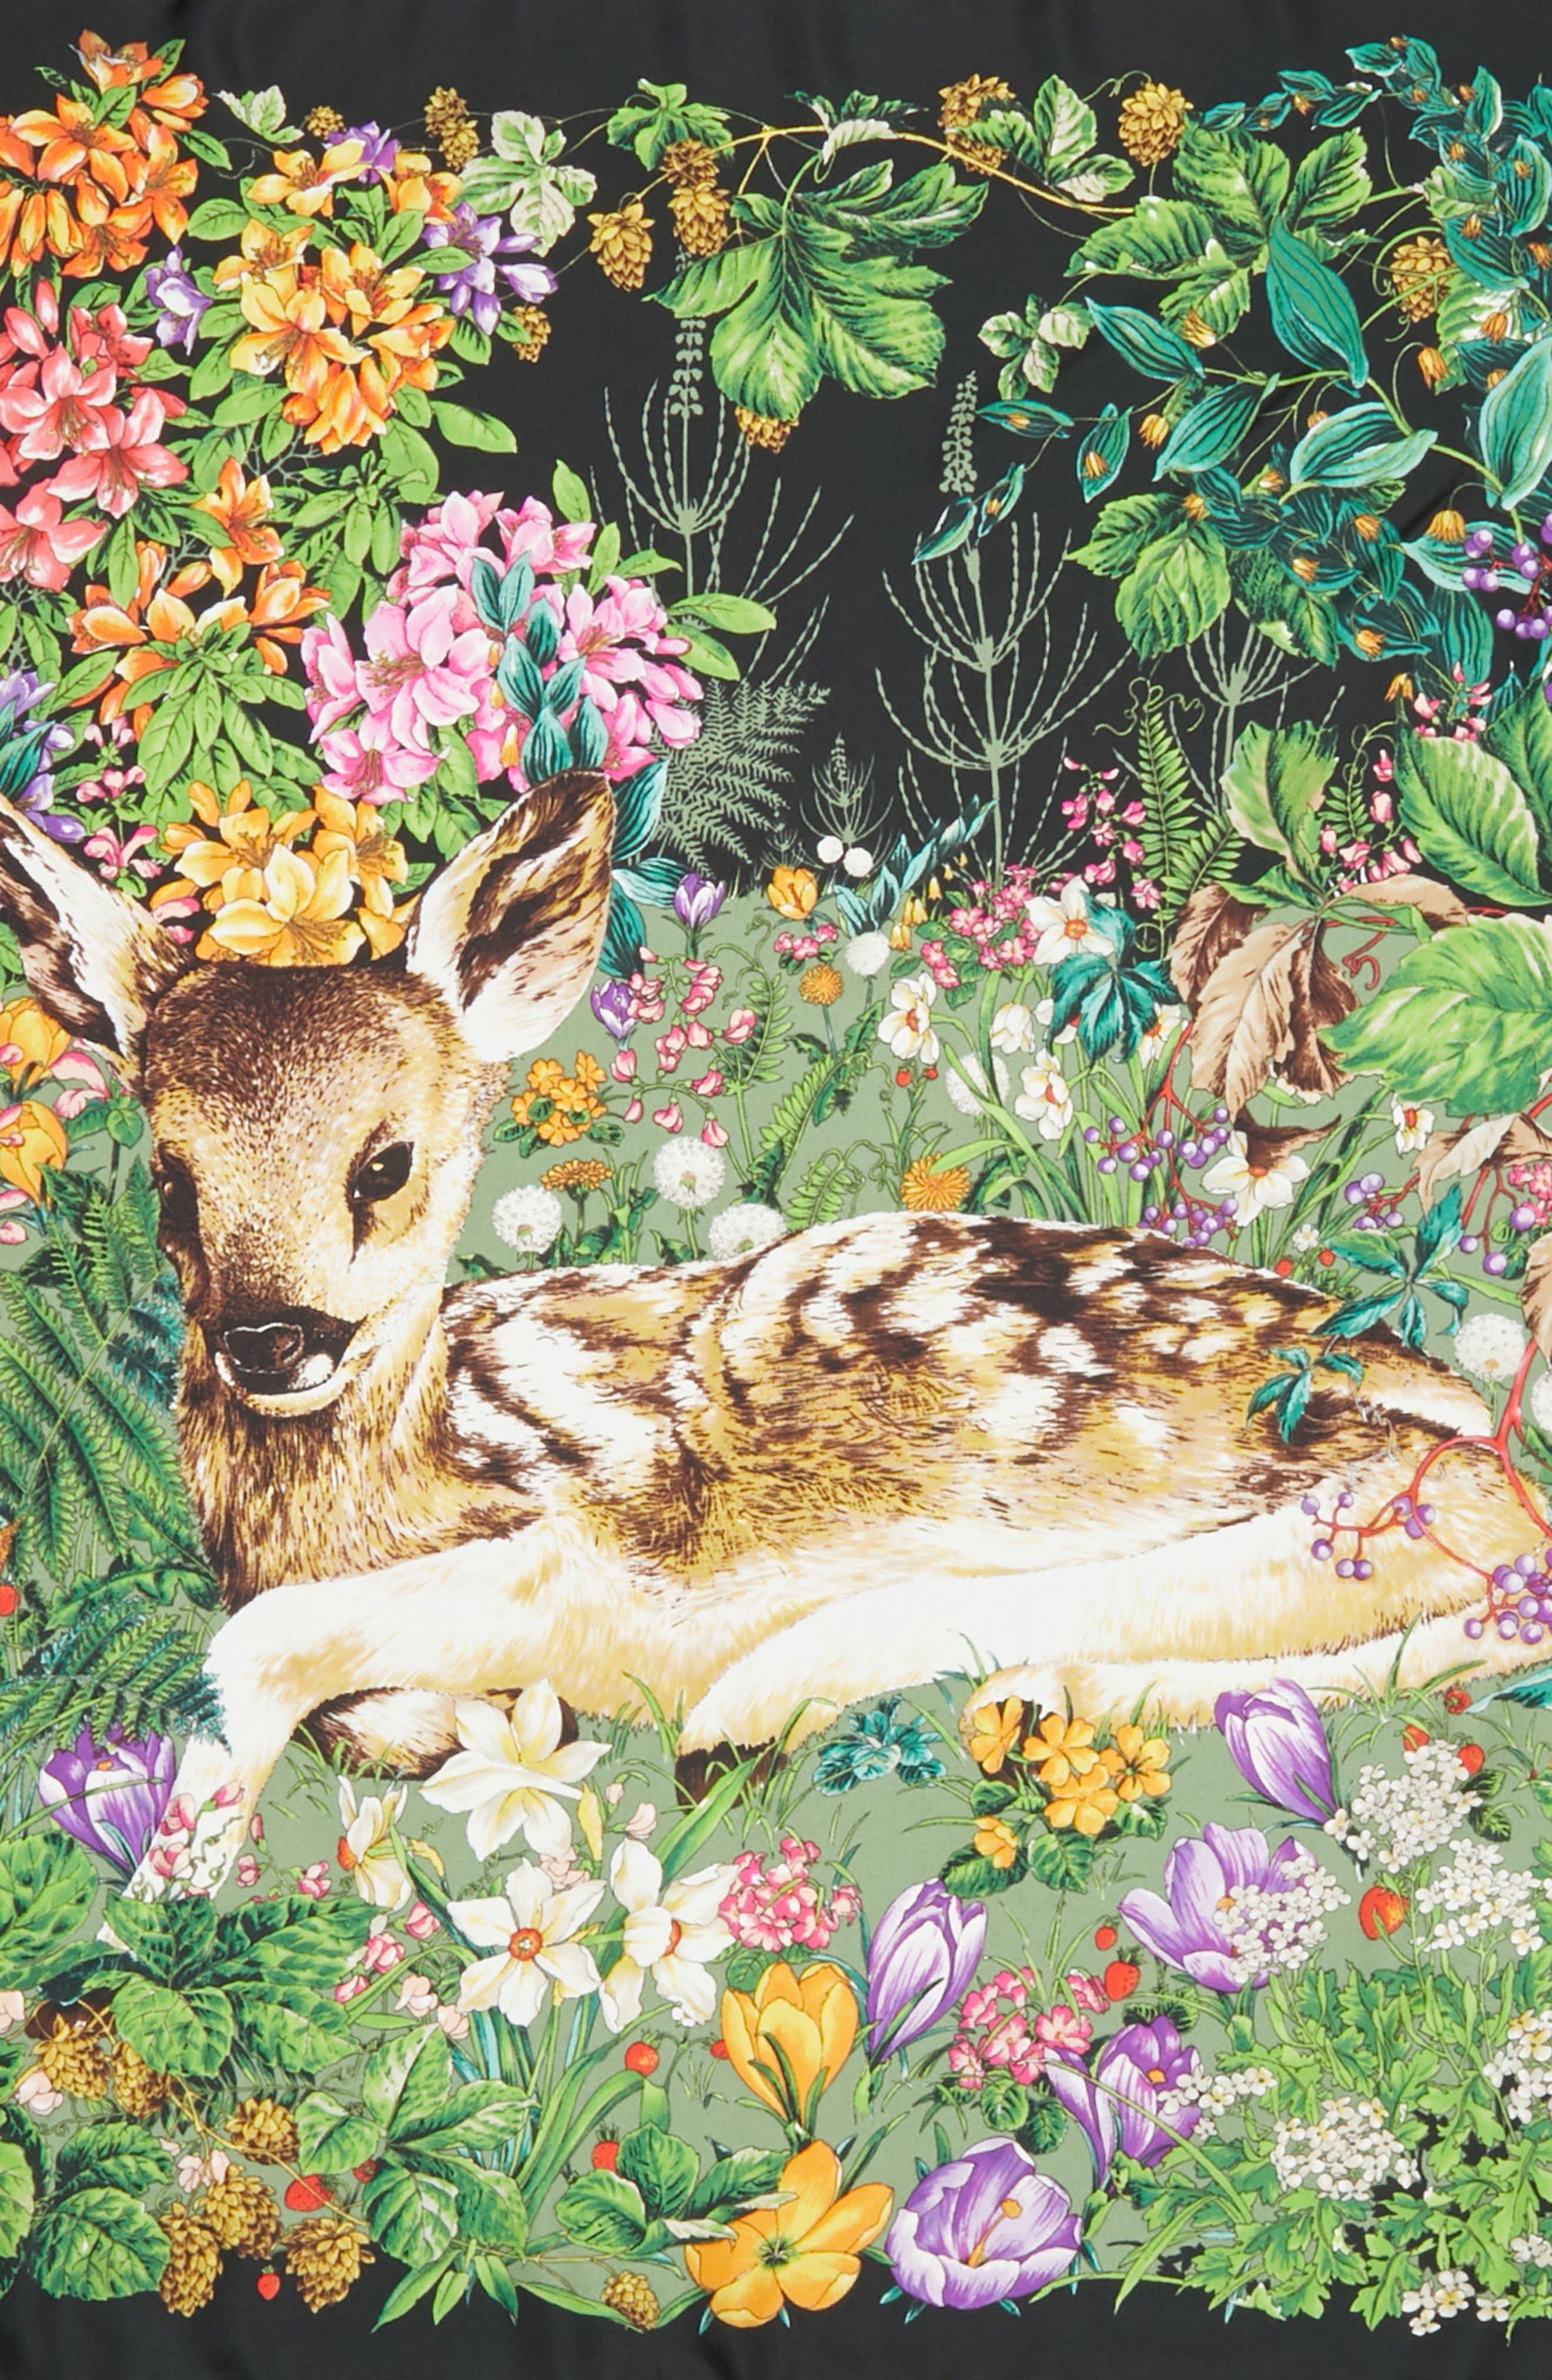 Flower Deer Foulard Silk Twill Scarf,                             Alternate thumbnail 4, color,                             Black/ Multicolor